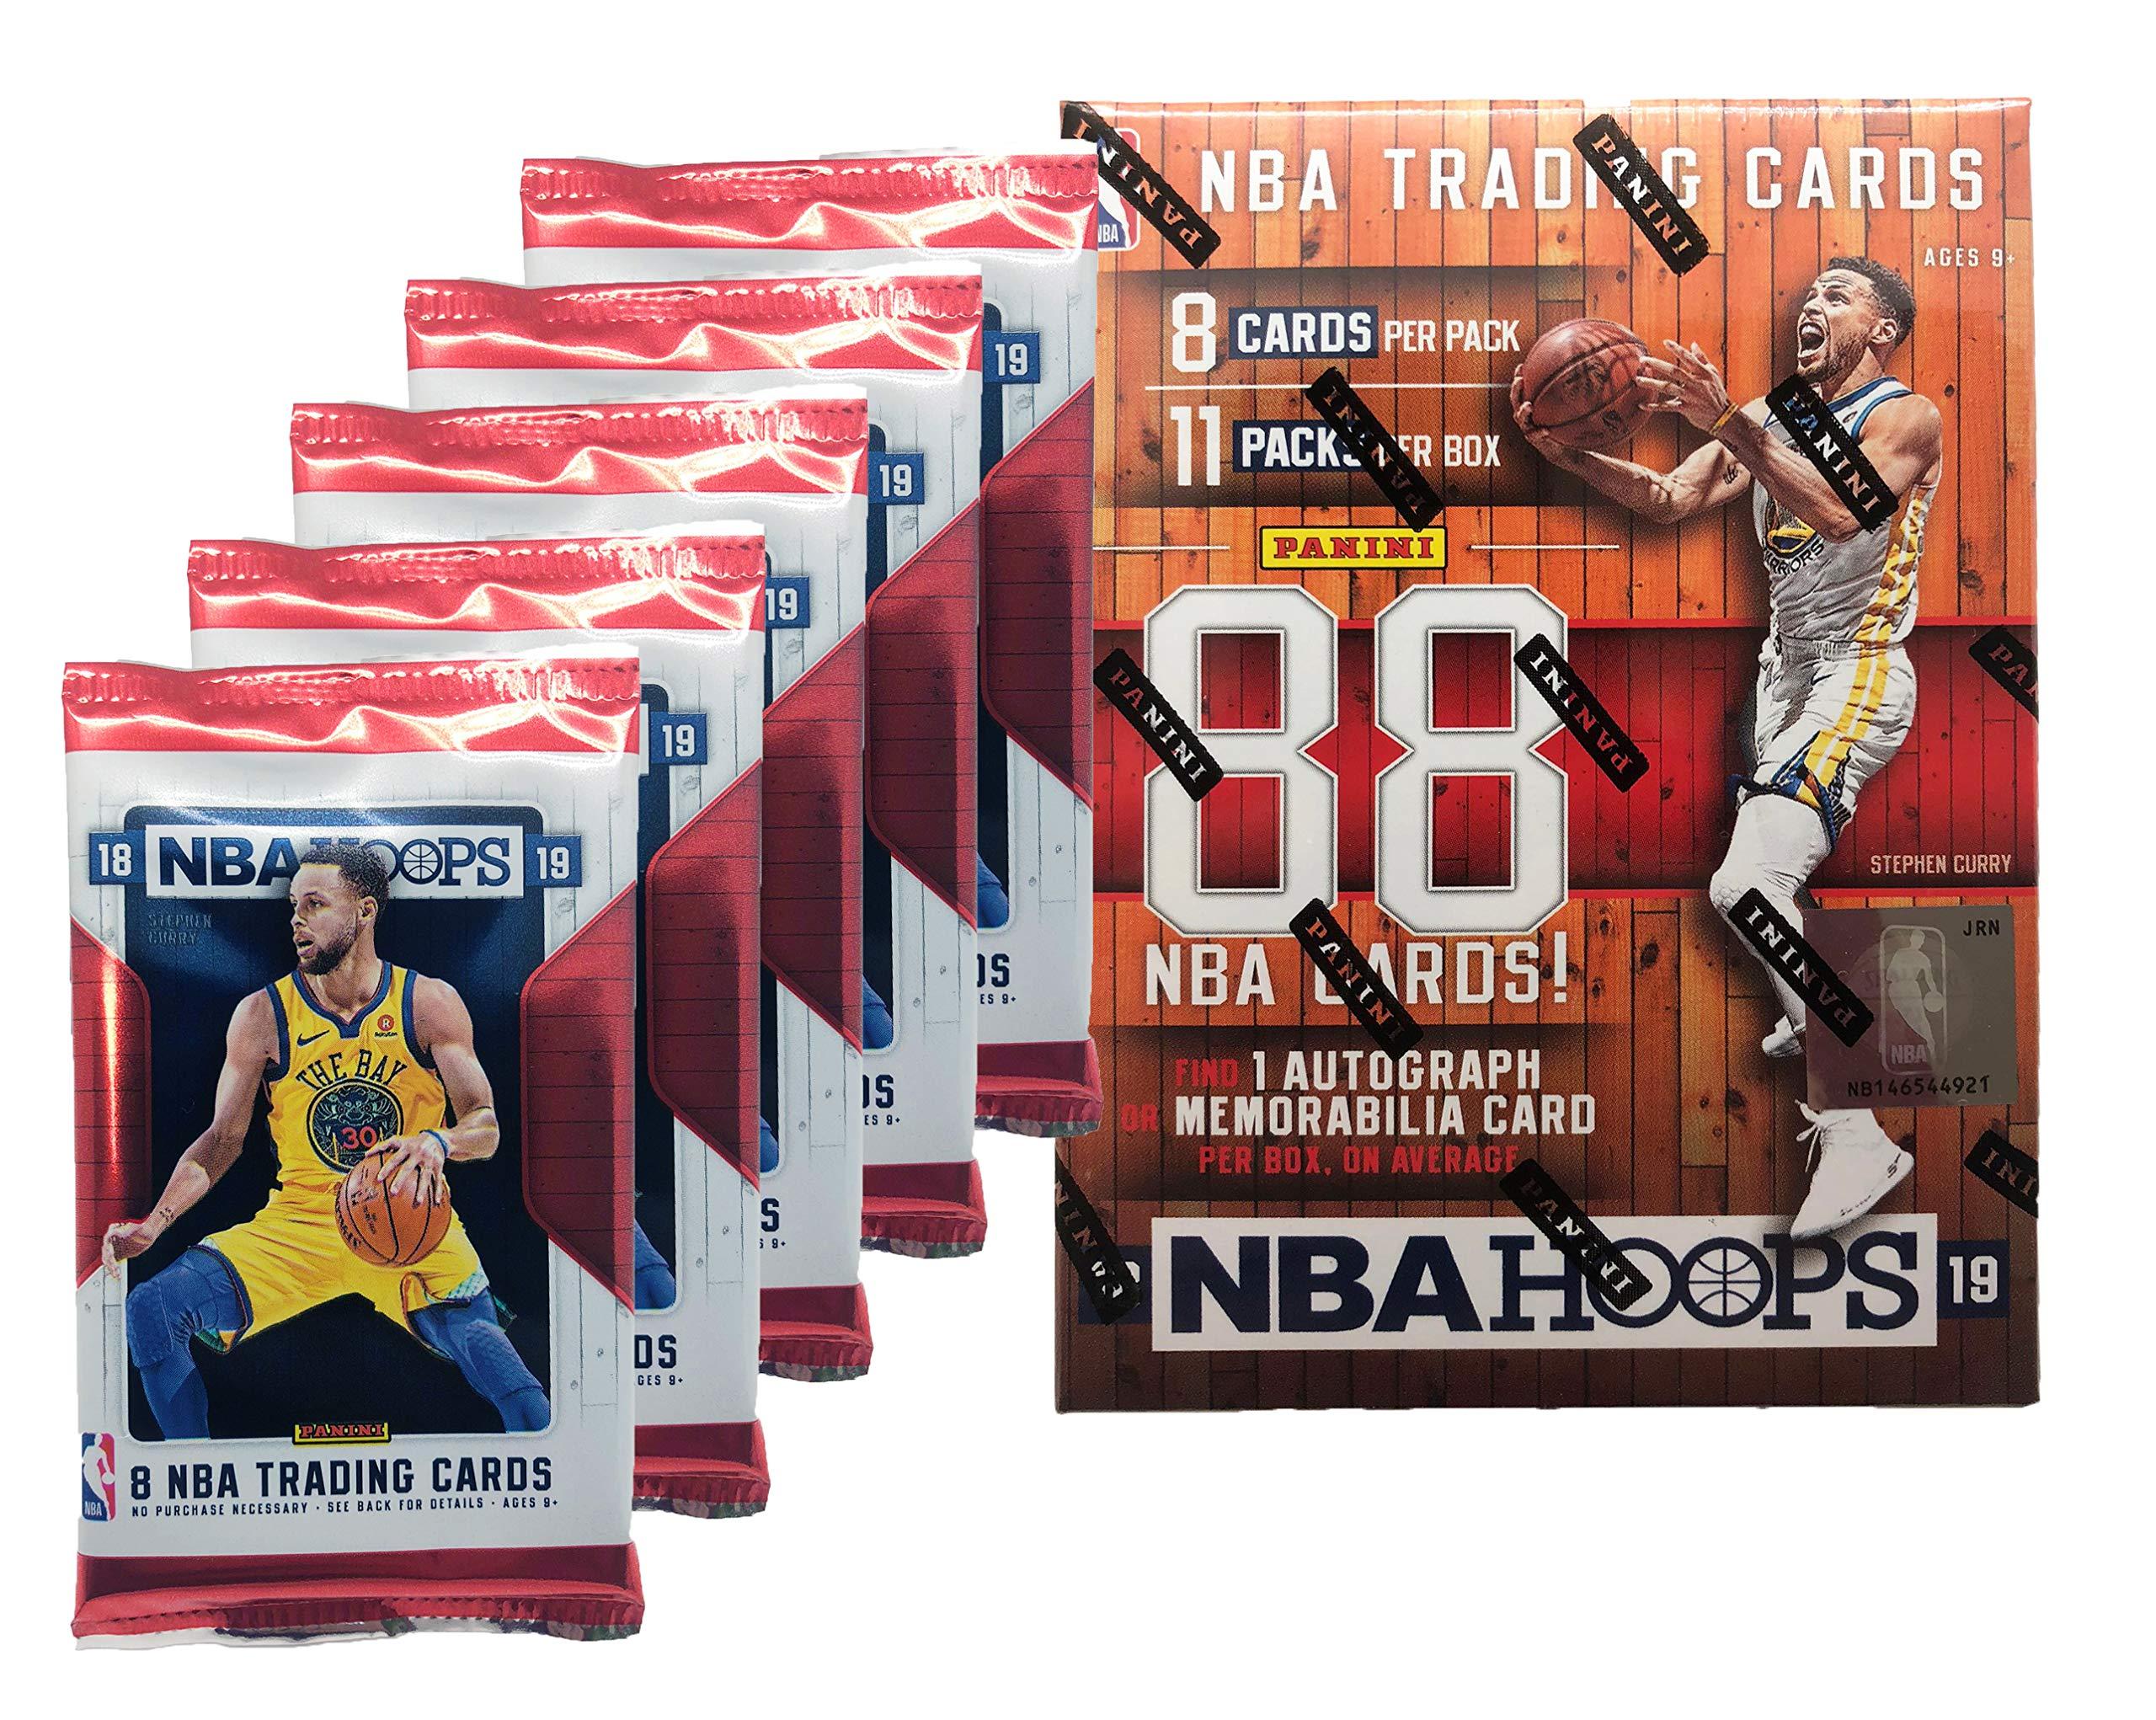 2018 - 2019 NBA Hoops Factory Sealed Basketball Cards w/ 1 AUTOGRAPH OR MEMORABILIA Card Per Box!!